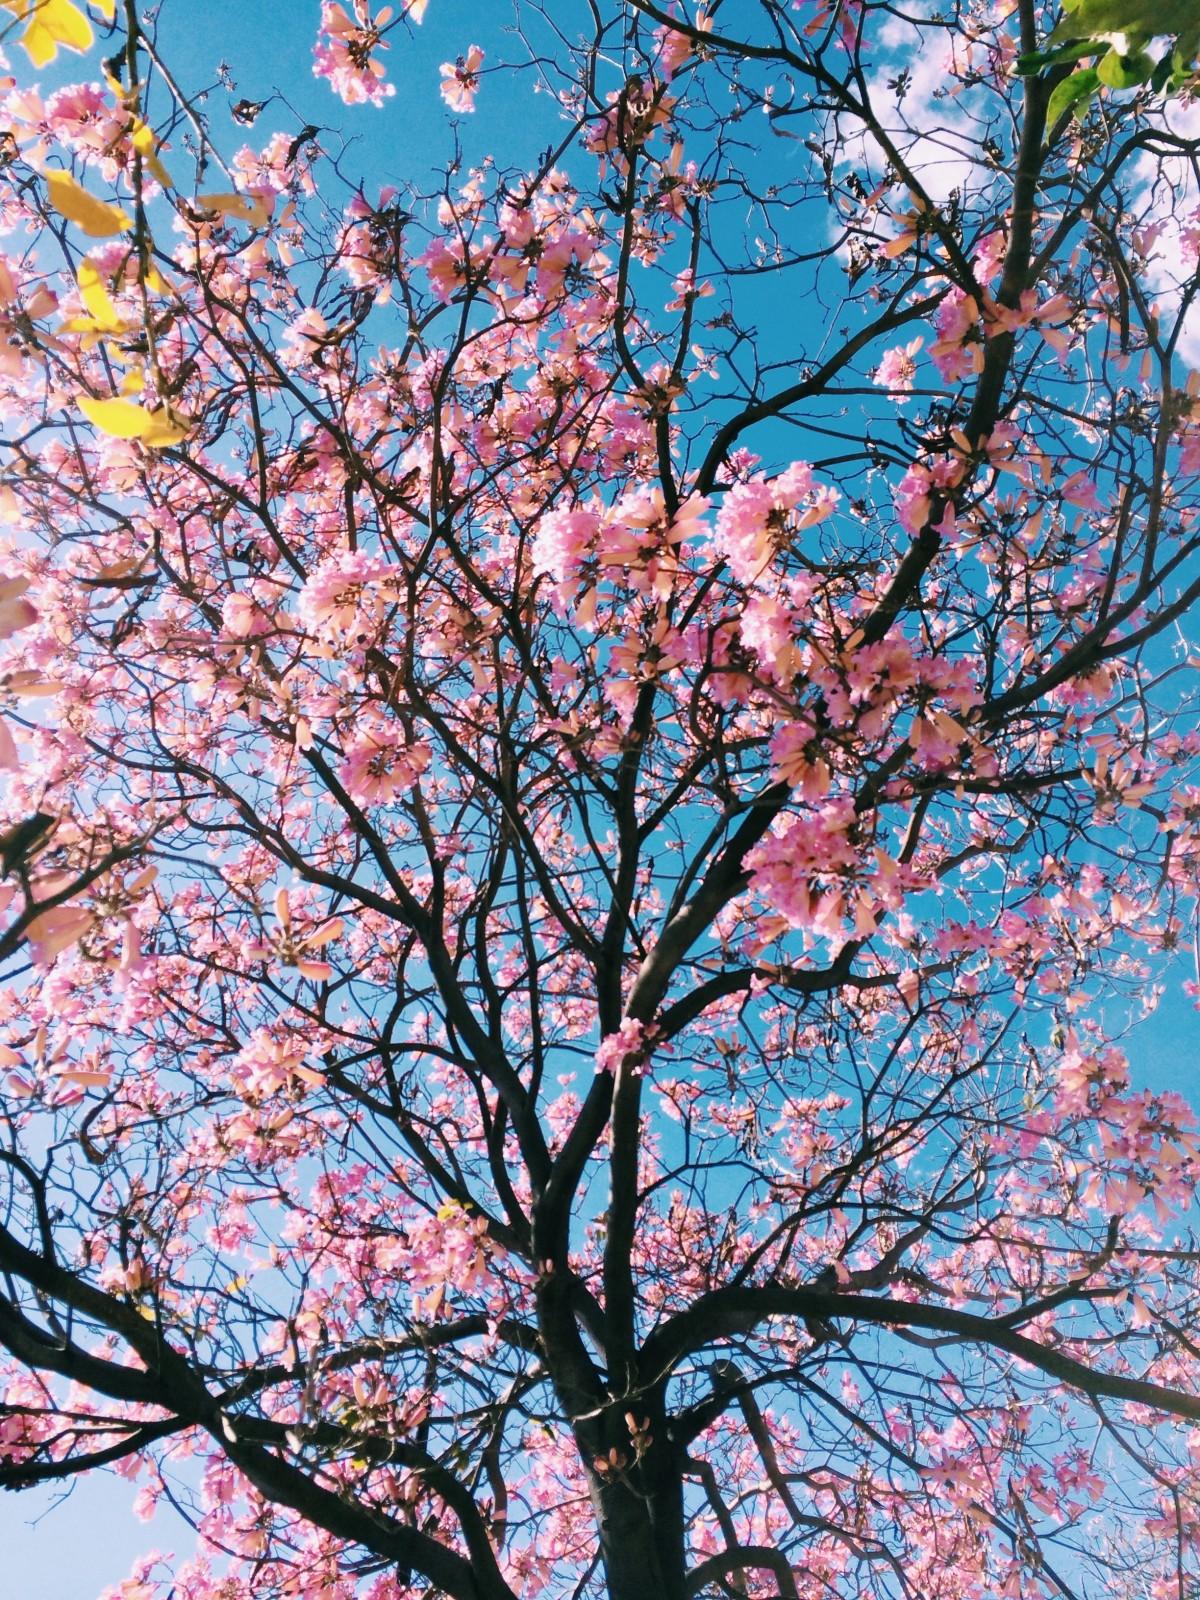 blossom_cherry_blossom_tree_leaf_nature-99664.jpg!d